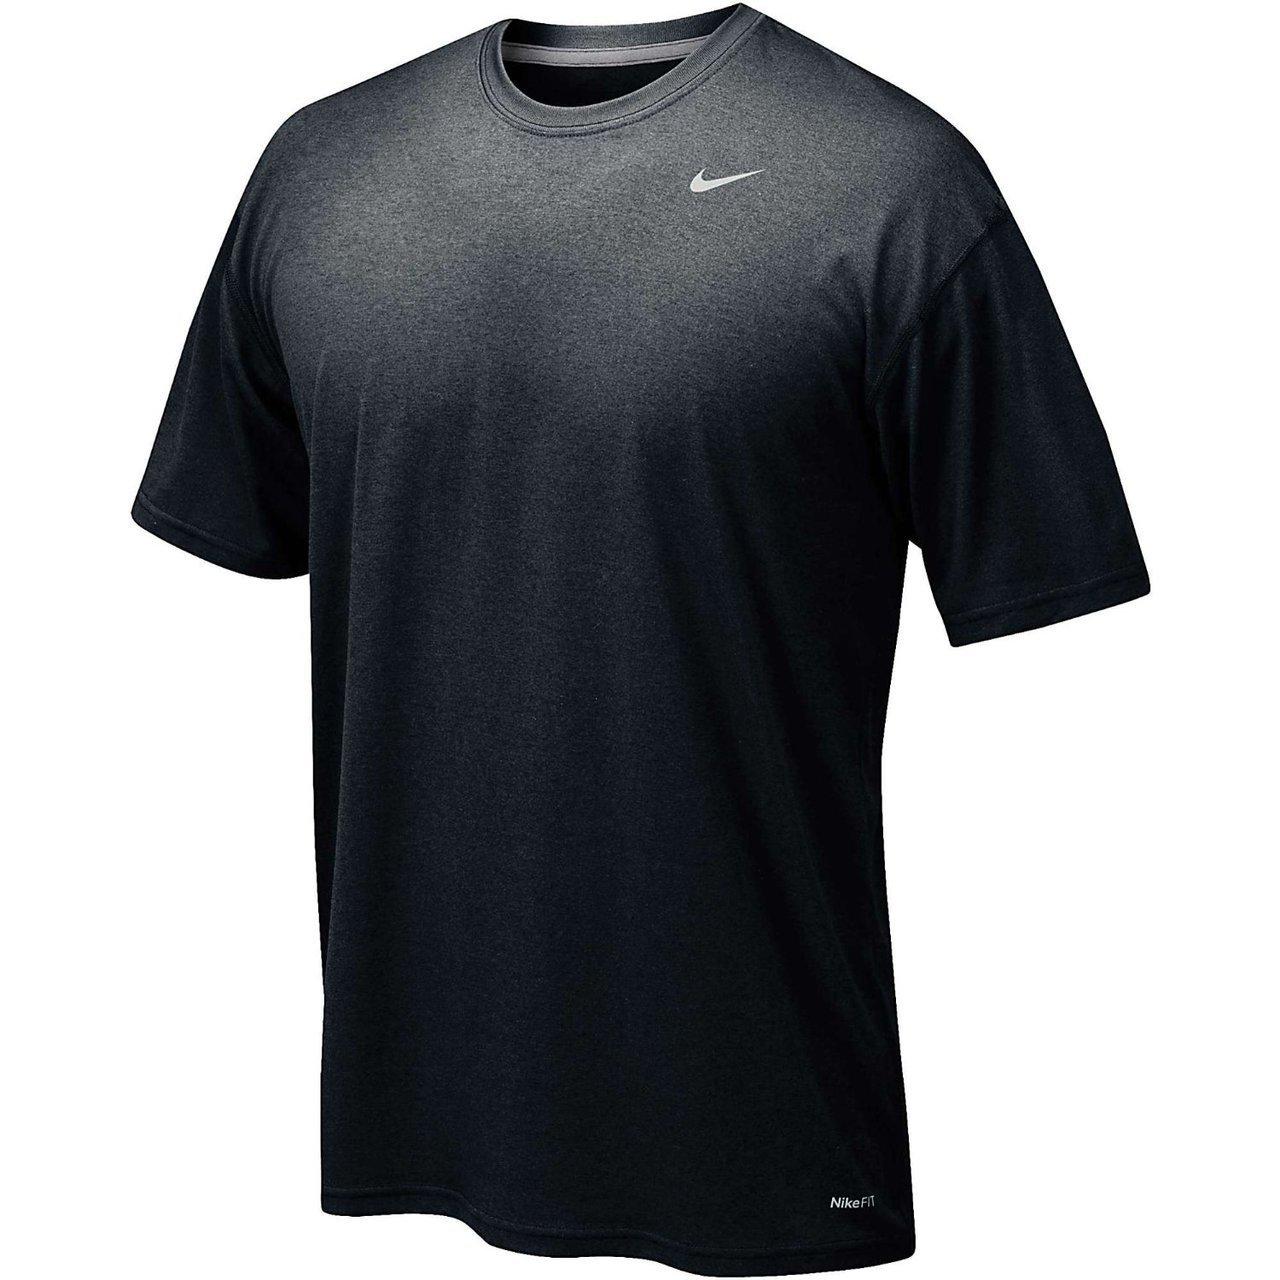 Nike Men's Legend Short Sleeve Tee, Black, L by NIKE